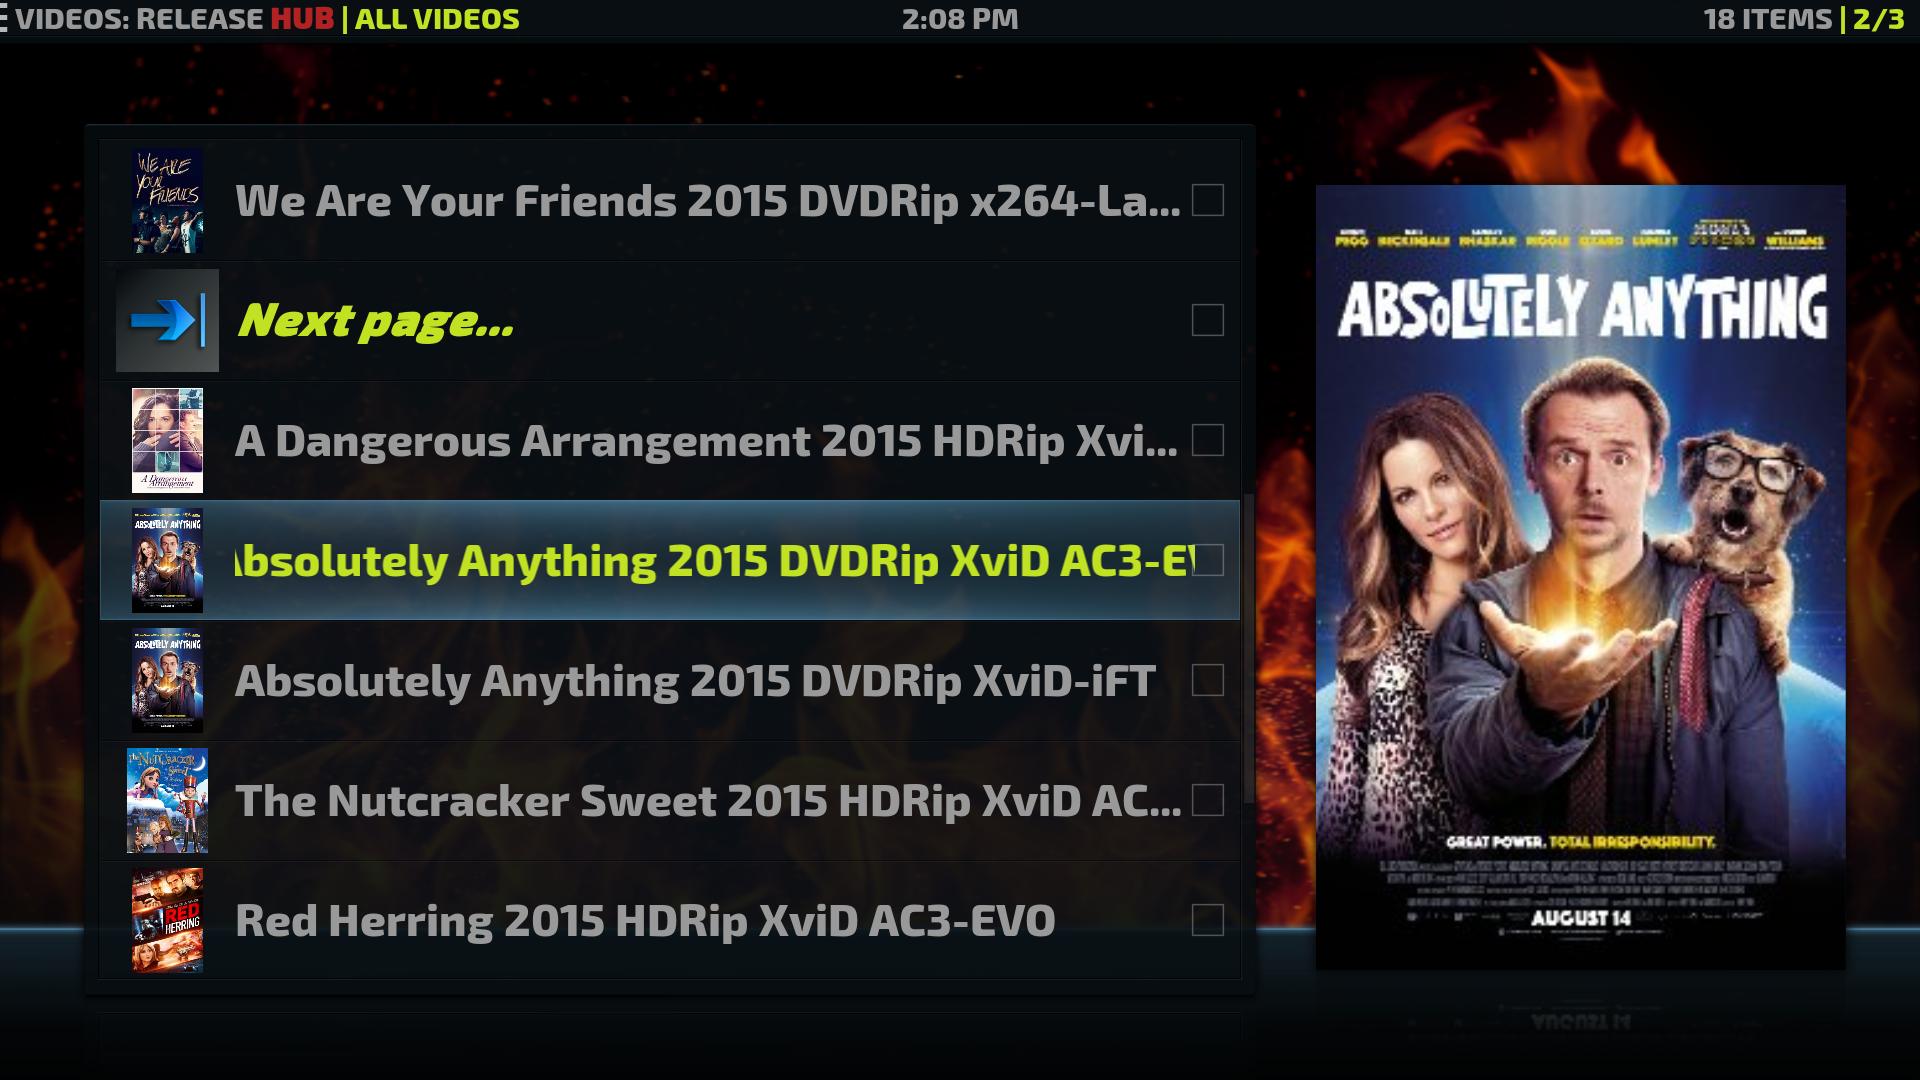 Screenshot 2015-11-12 14.08.53